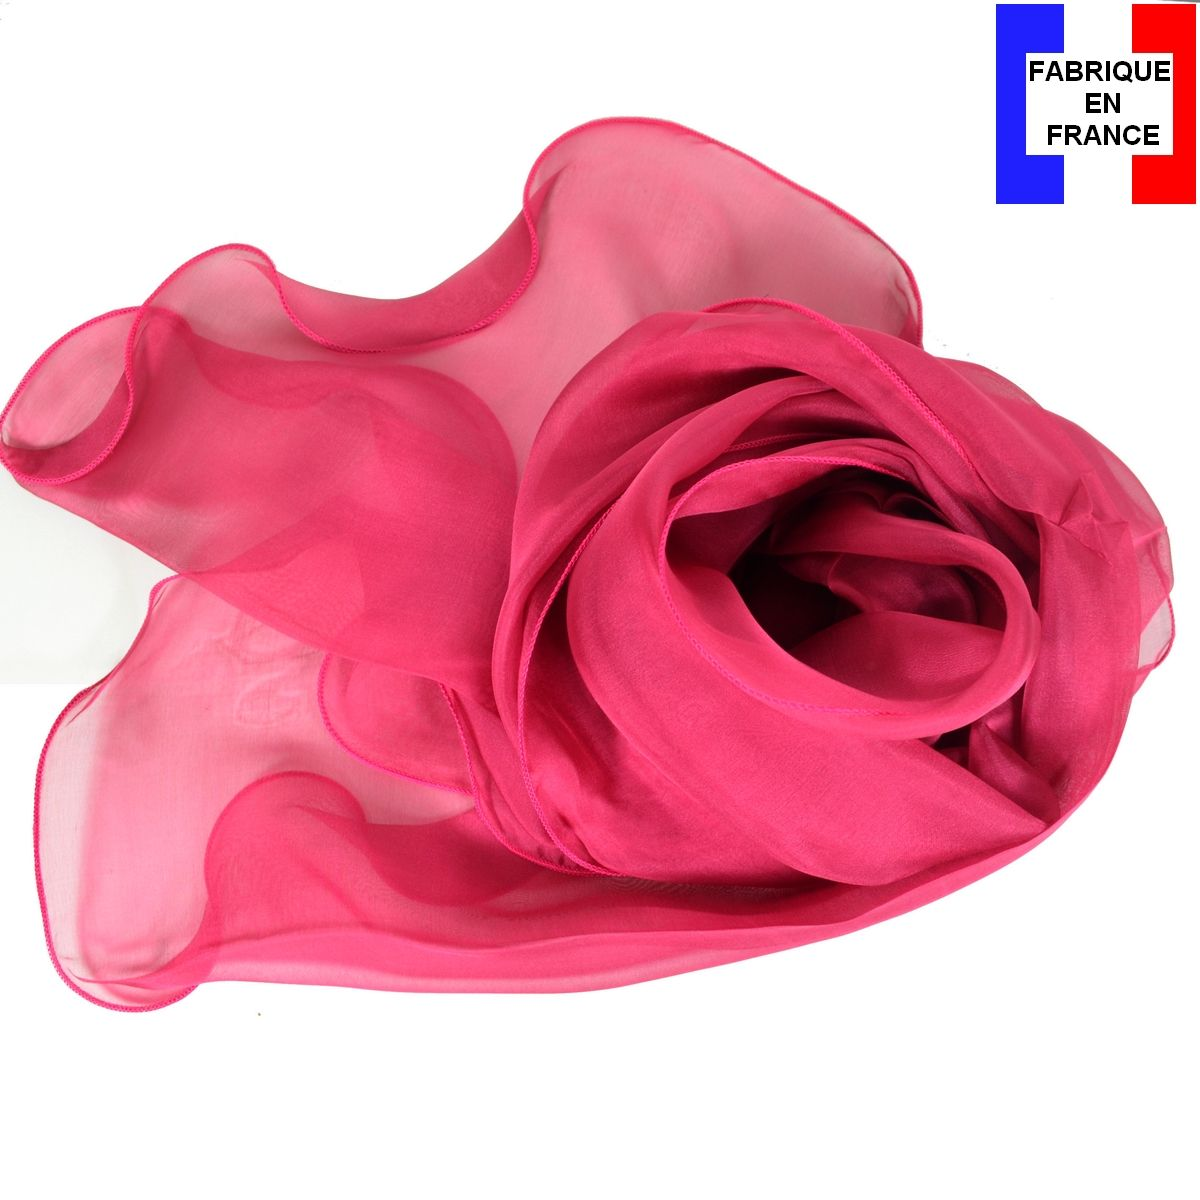 51d87d3e36b Foulard soie bords ondulés rose